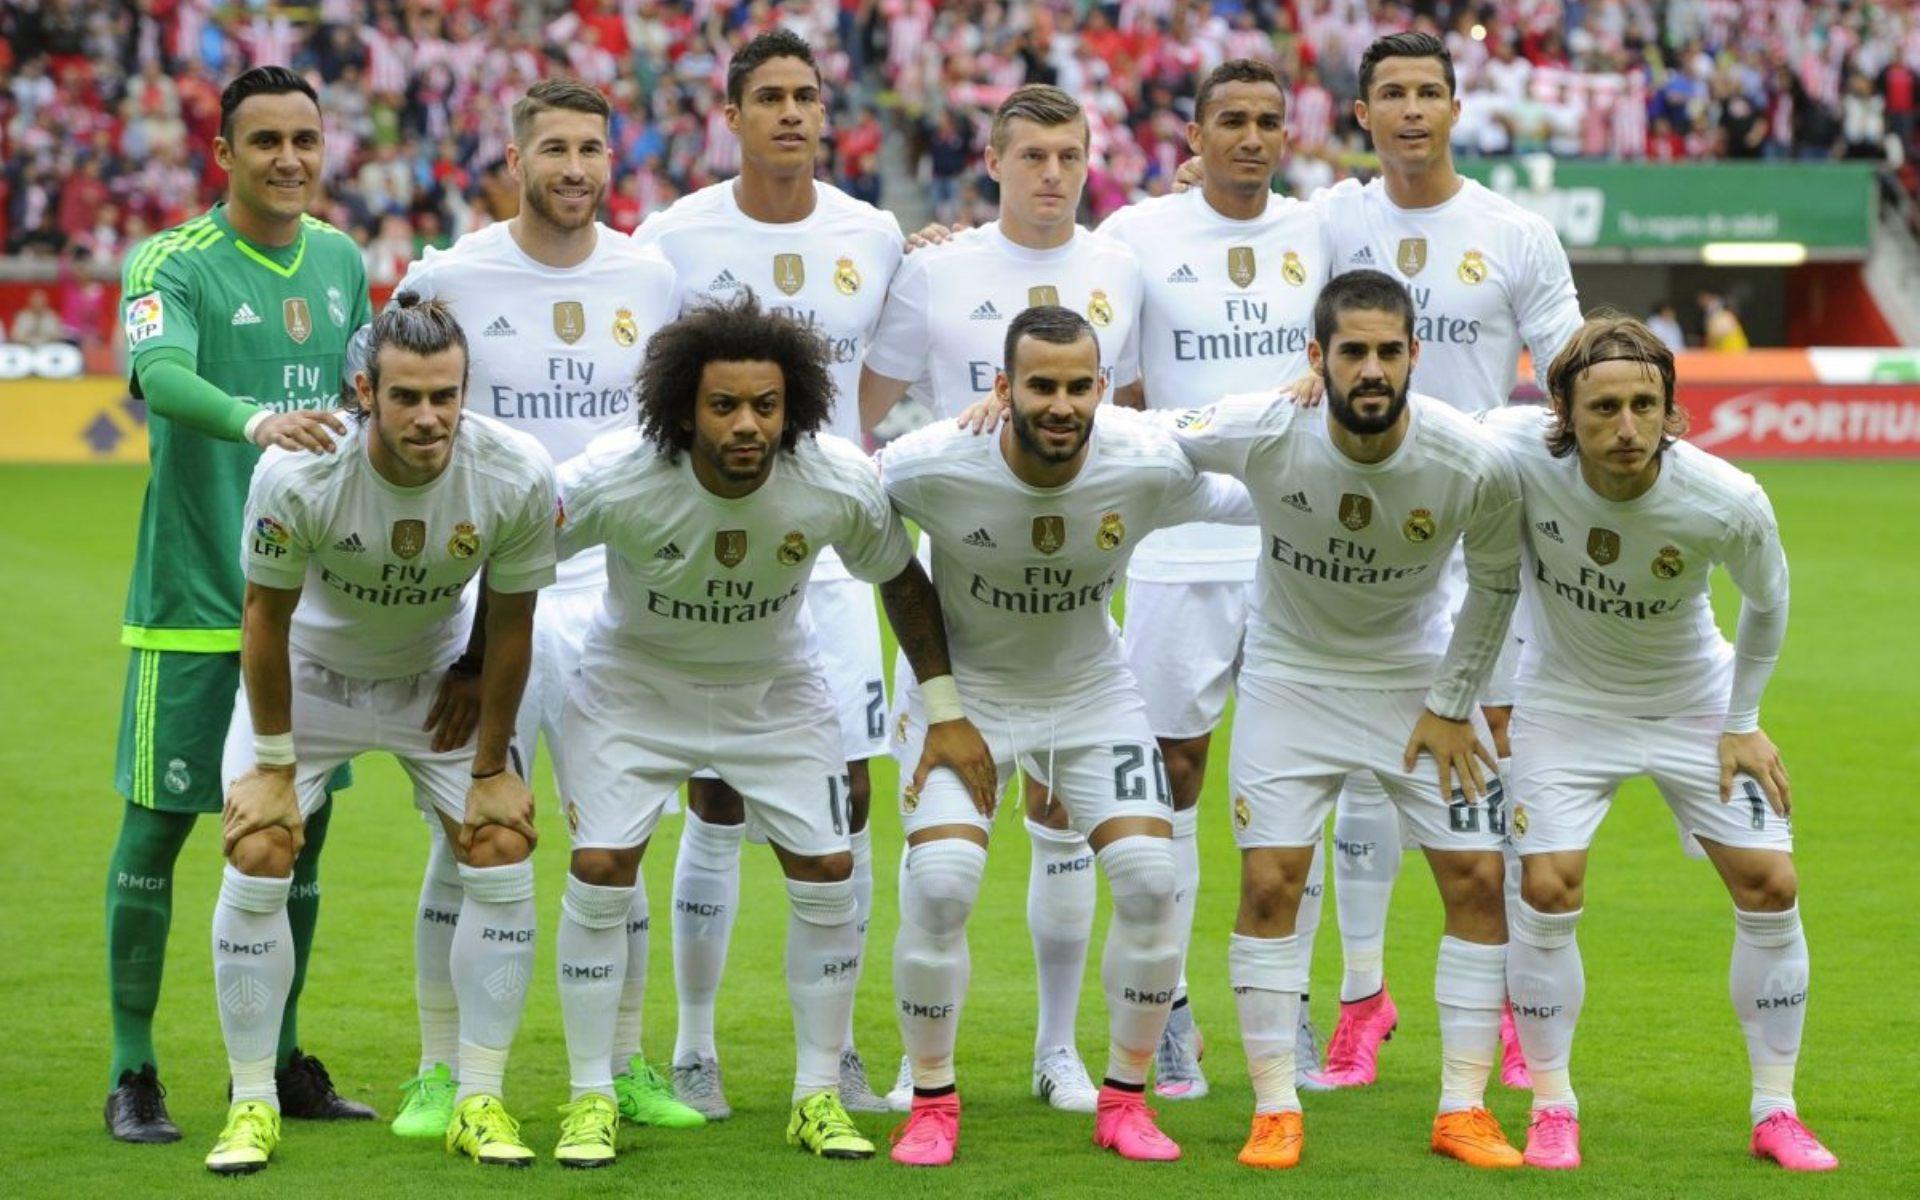 Фото про футбол реал мадрид